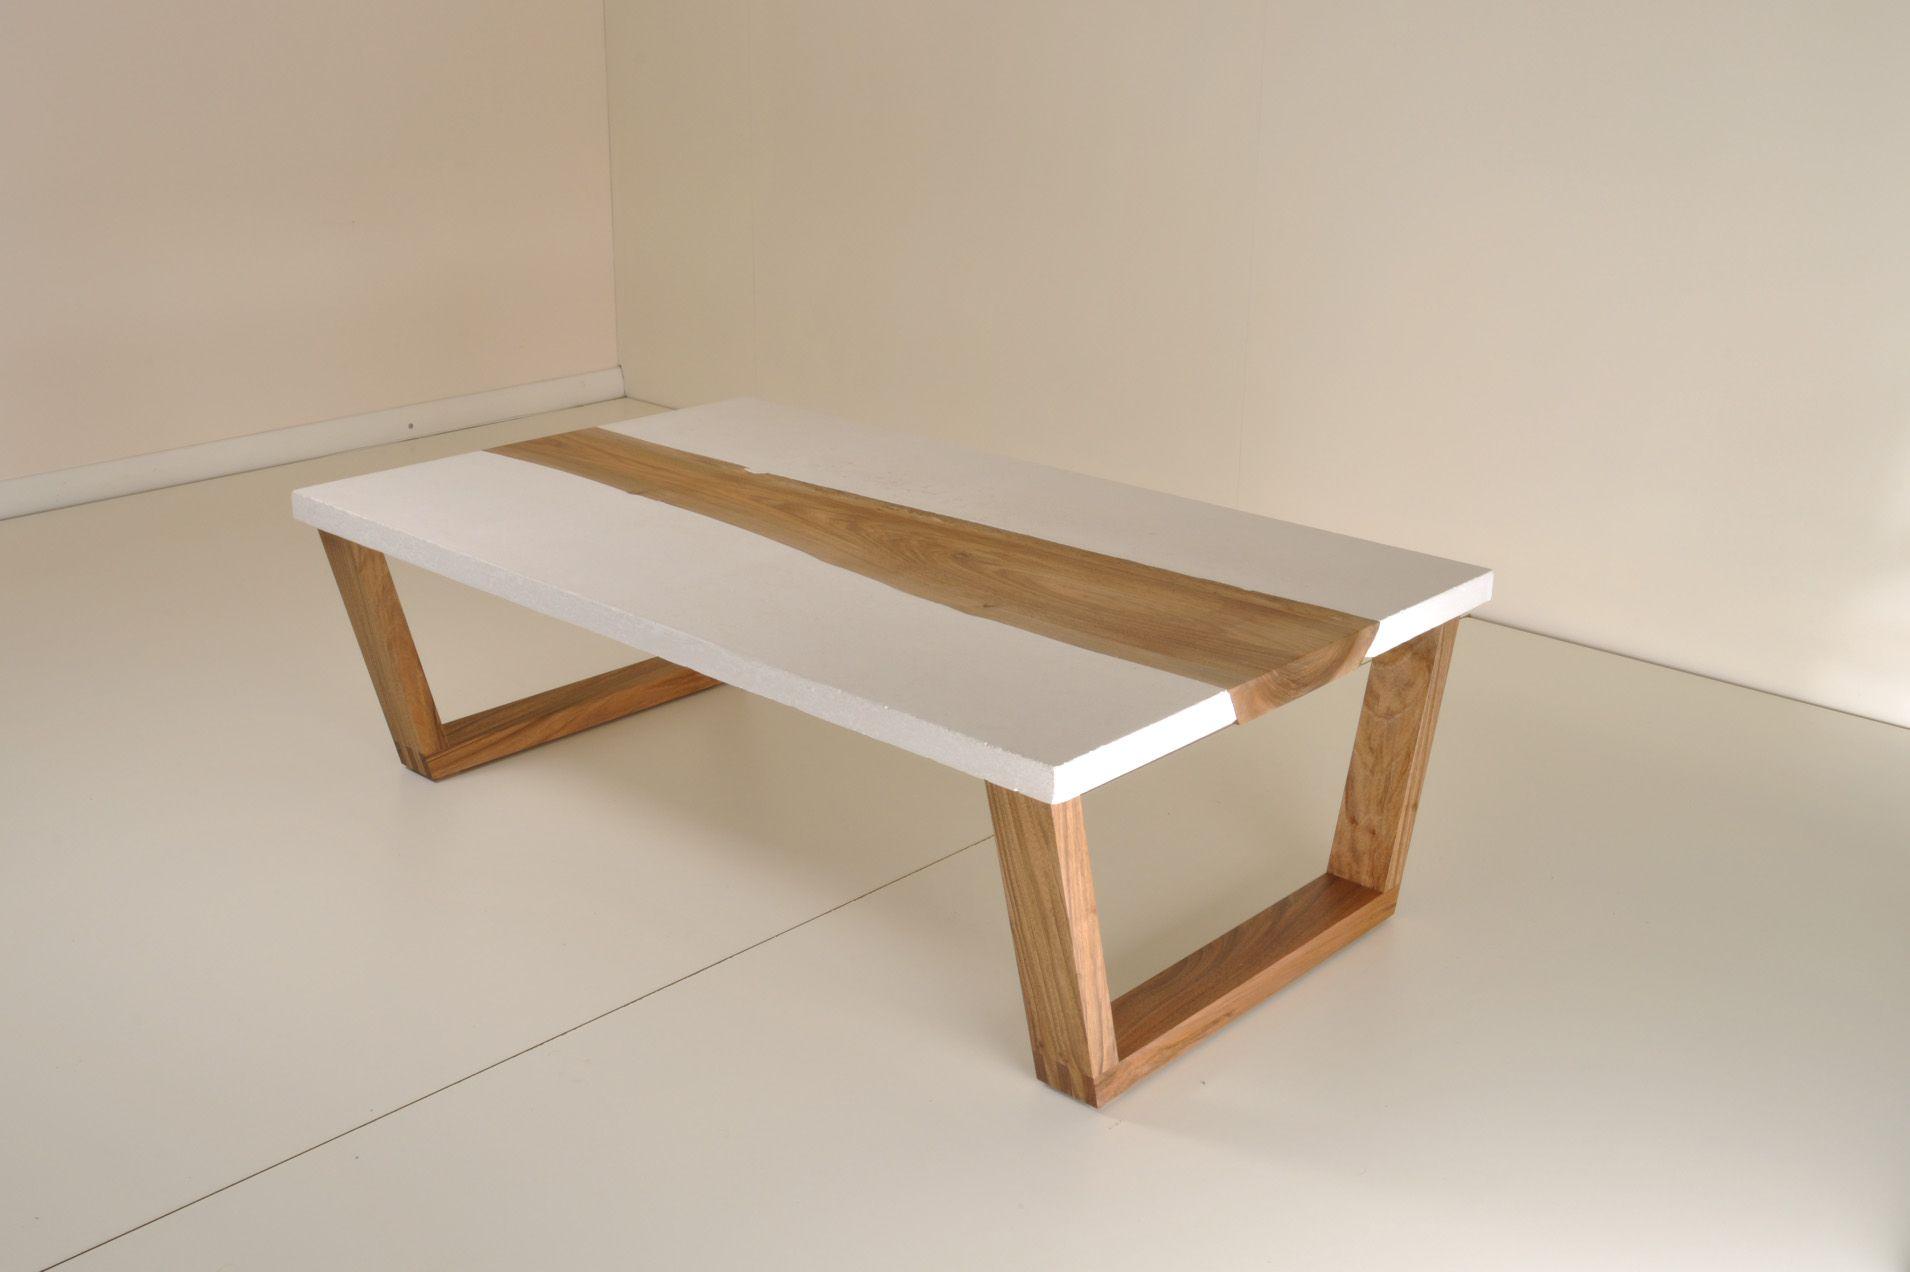 Coffee Table By Peter Kindt, Designer Maker